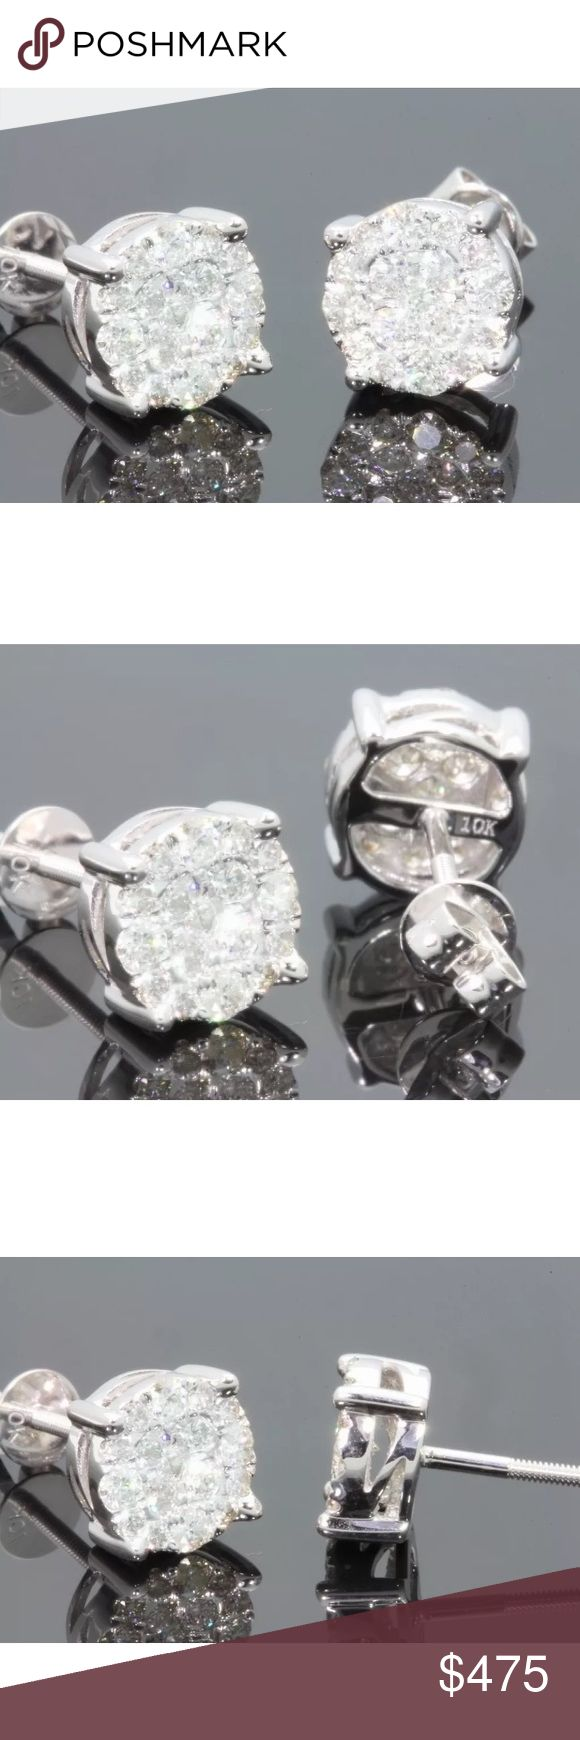 Gorgeous 1 carat 10k white gold diamond earrings Gorgeous 1 carat 10k white gold diamond earrings Jewelry Earrings